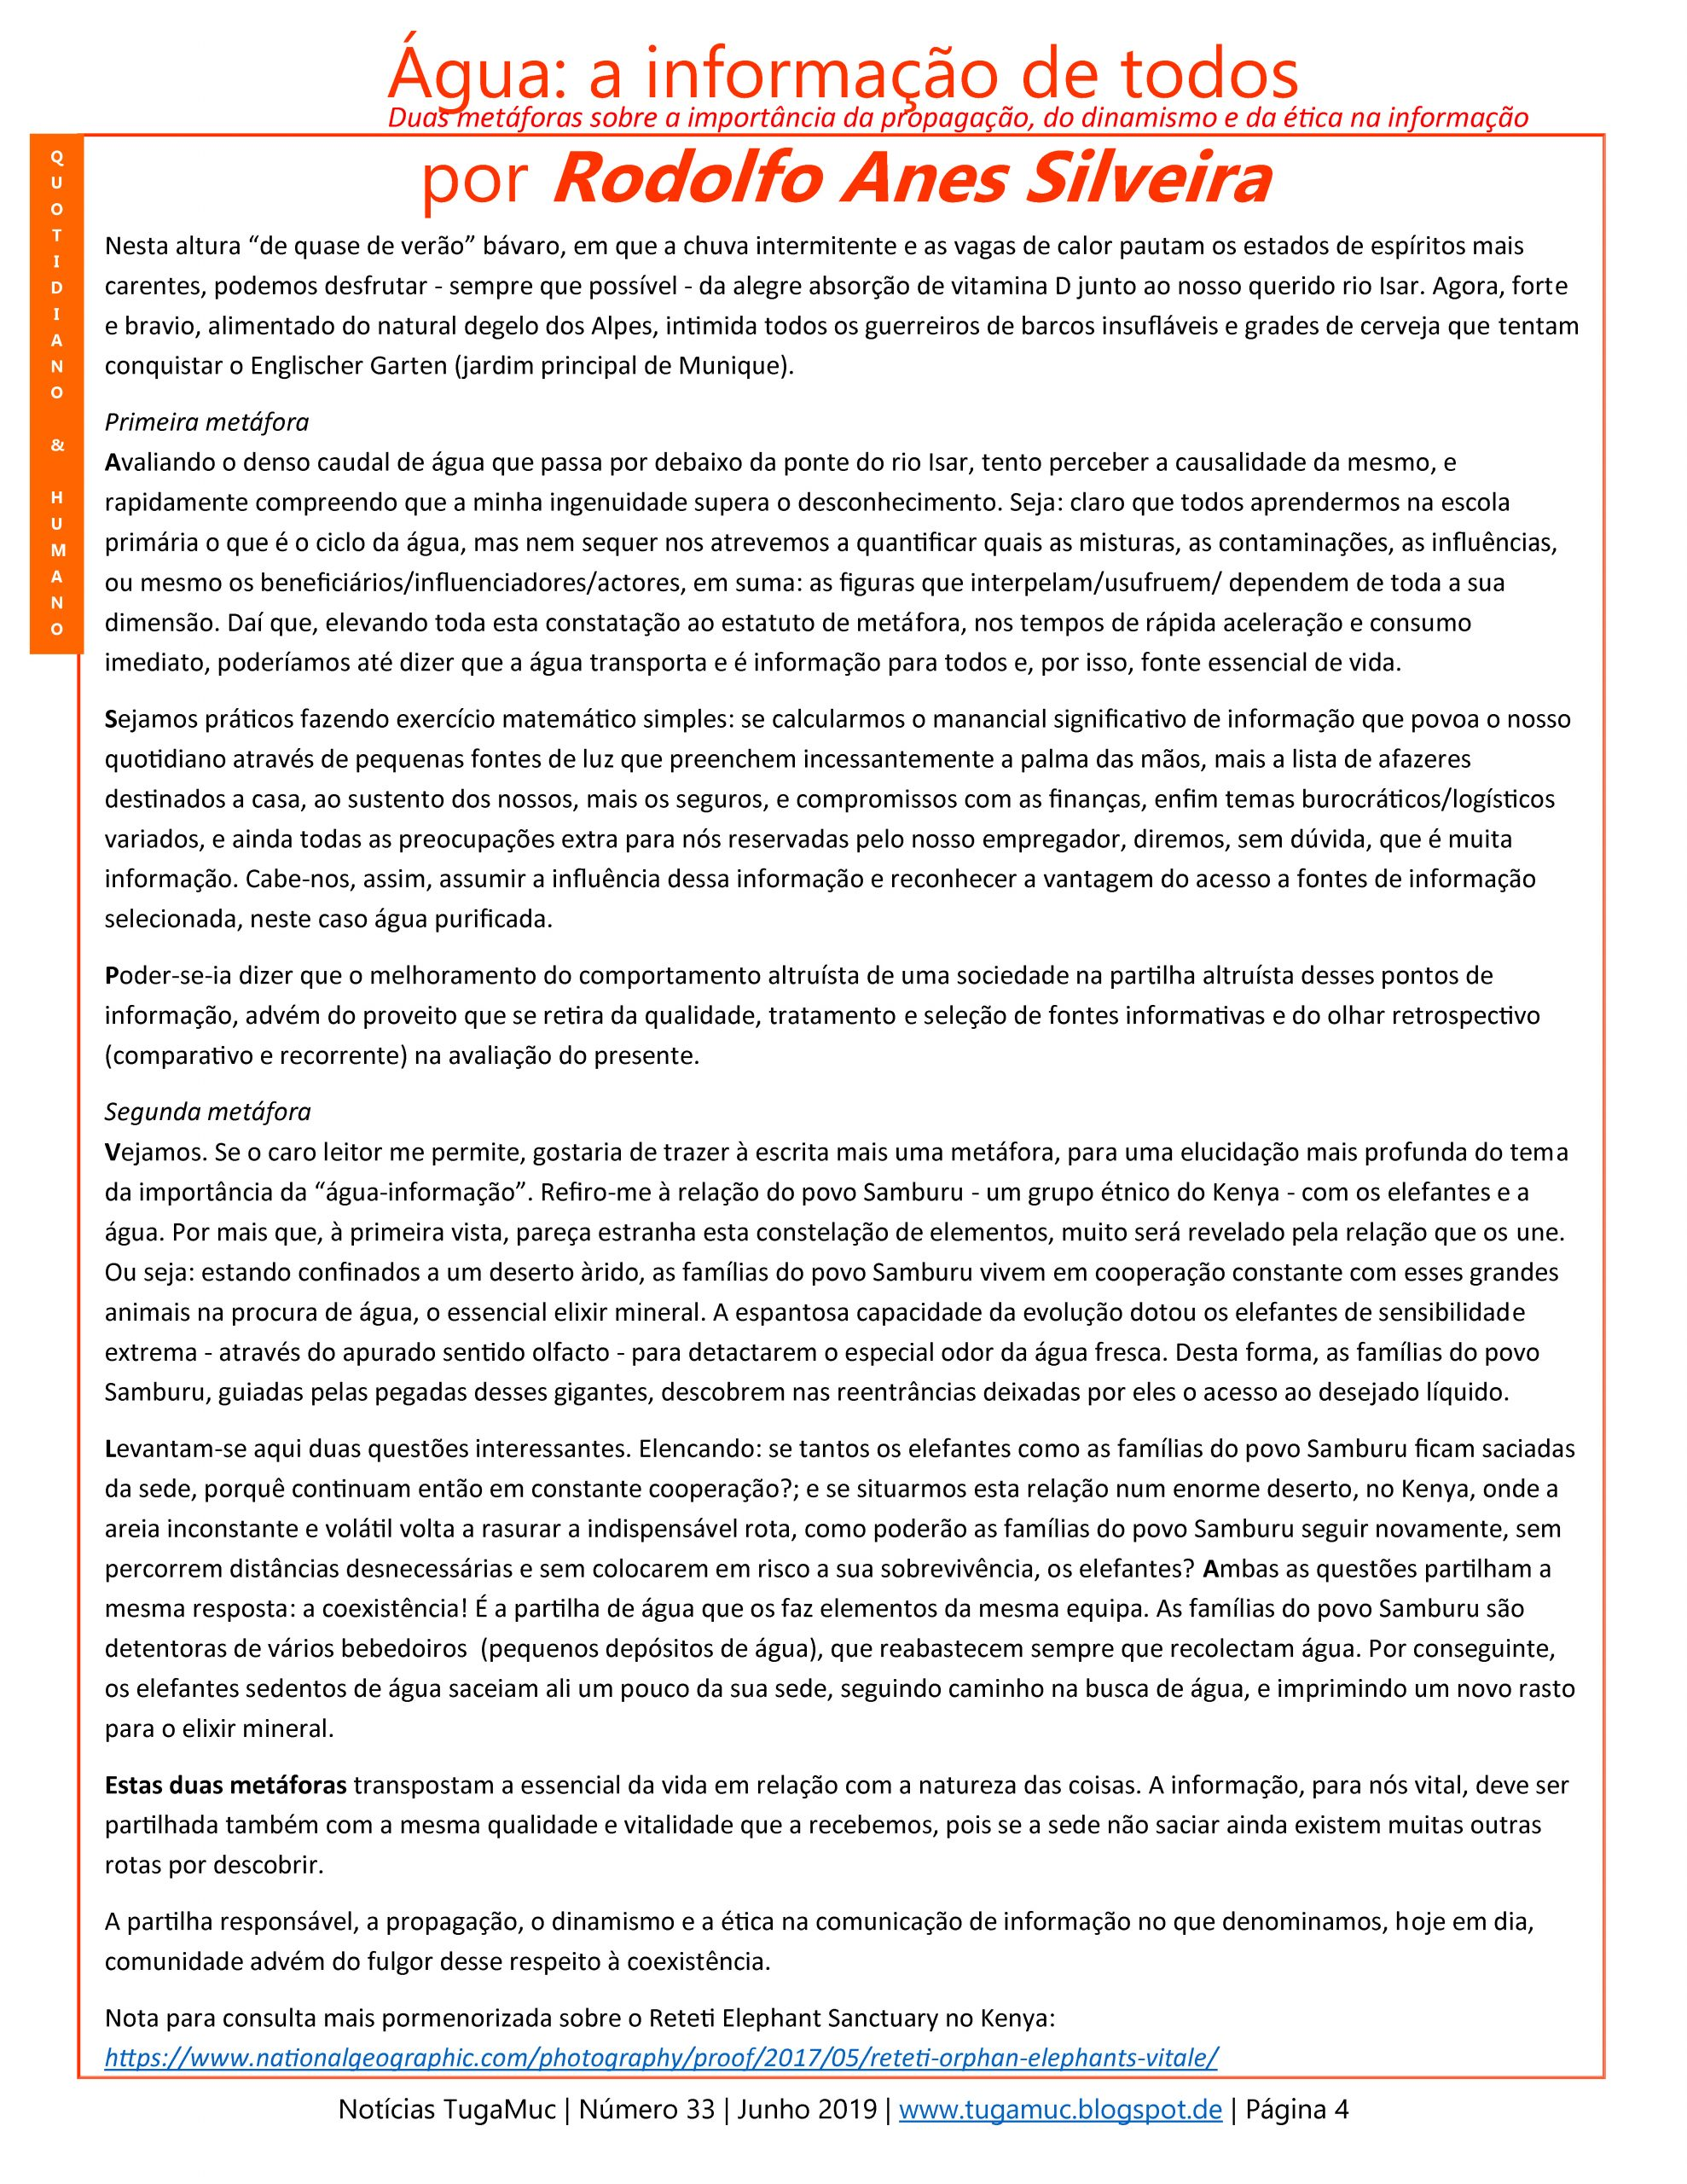 Texto-Agua-informacao-Tugmuc-Número-33-Março-2019